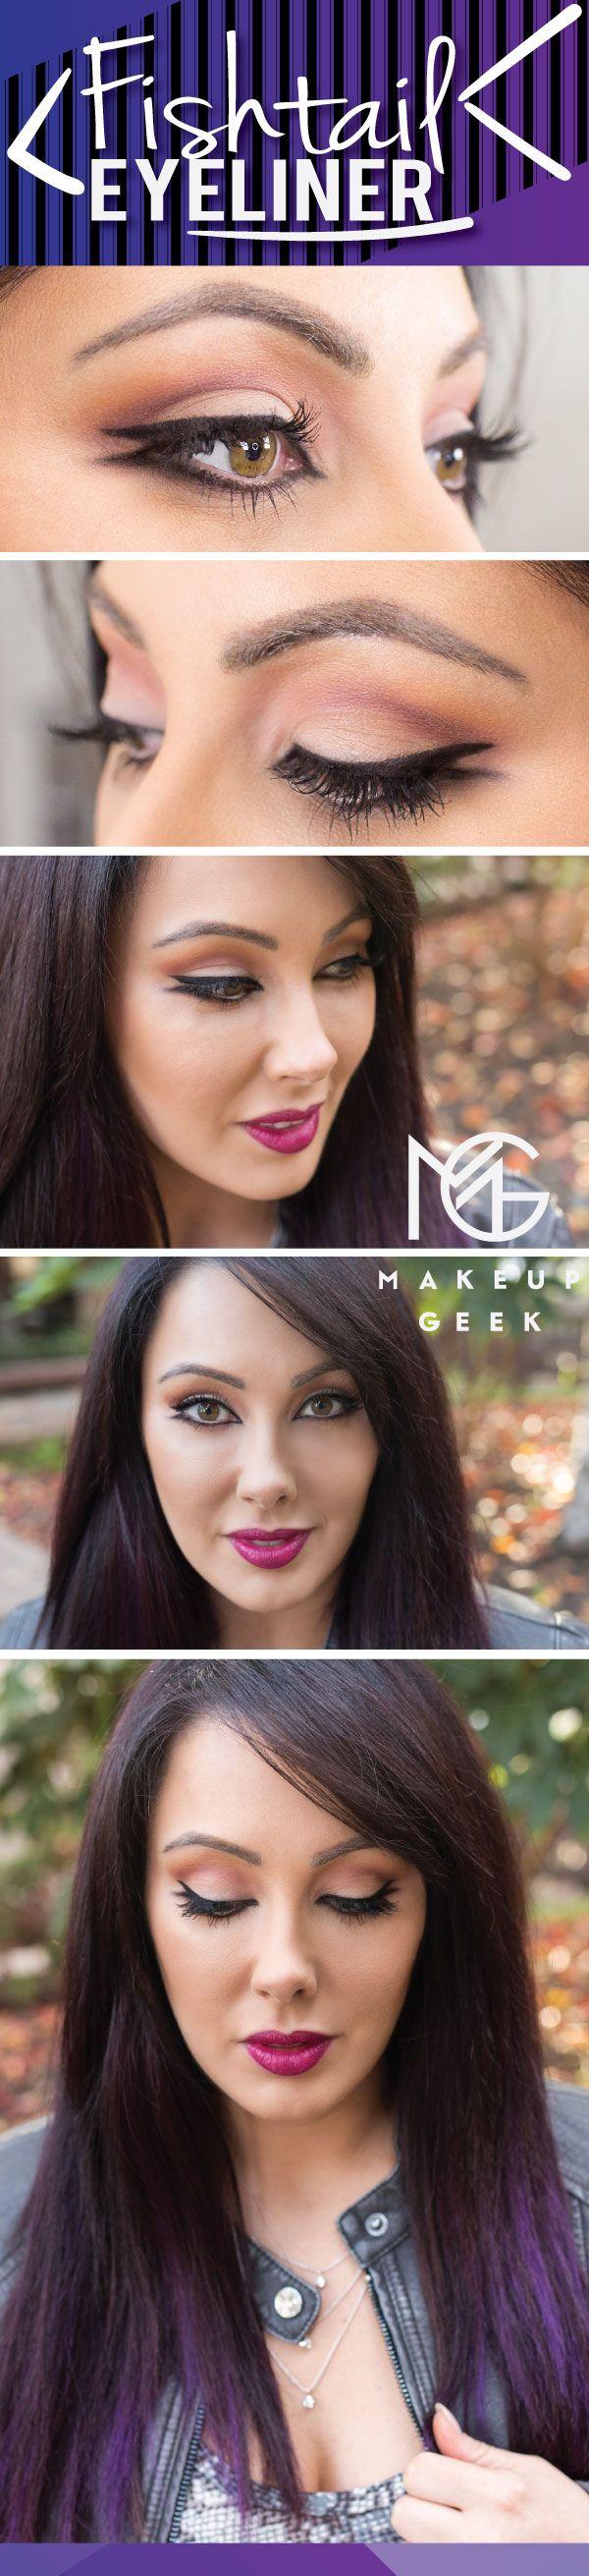 fishtail eyeliner styles tutorial (1)